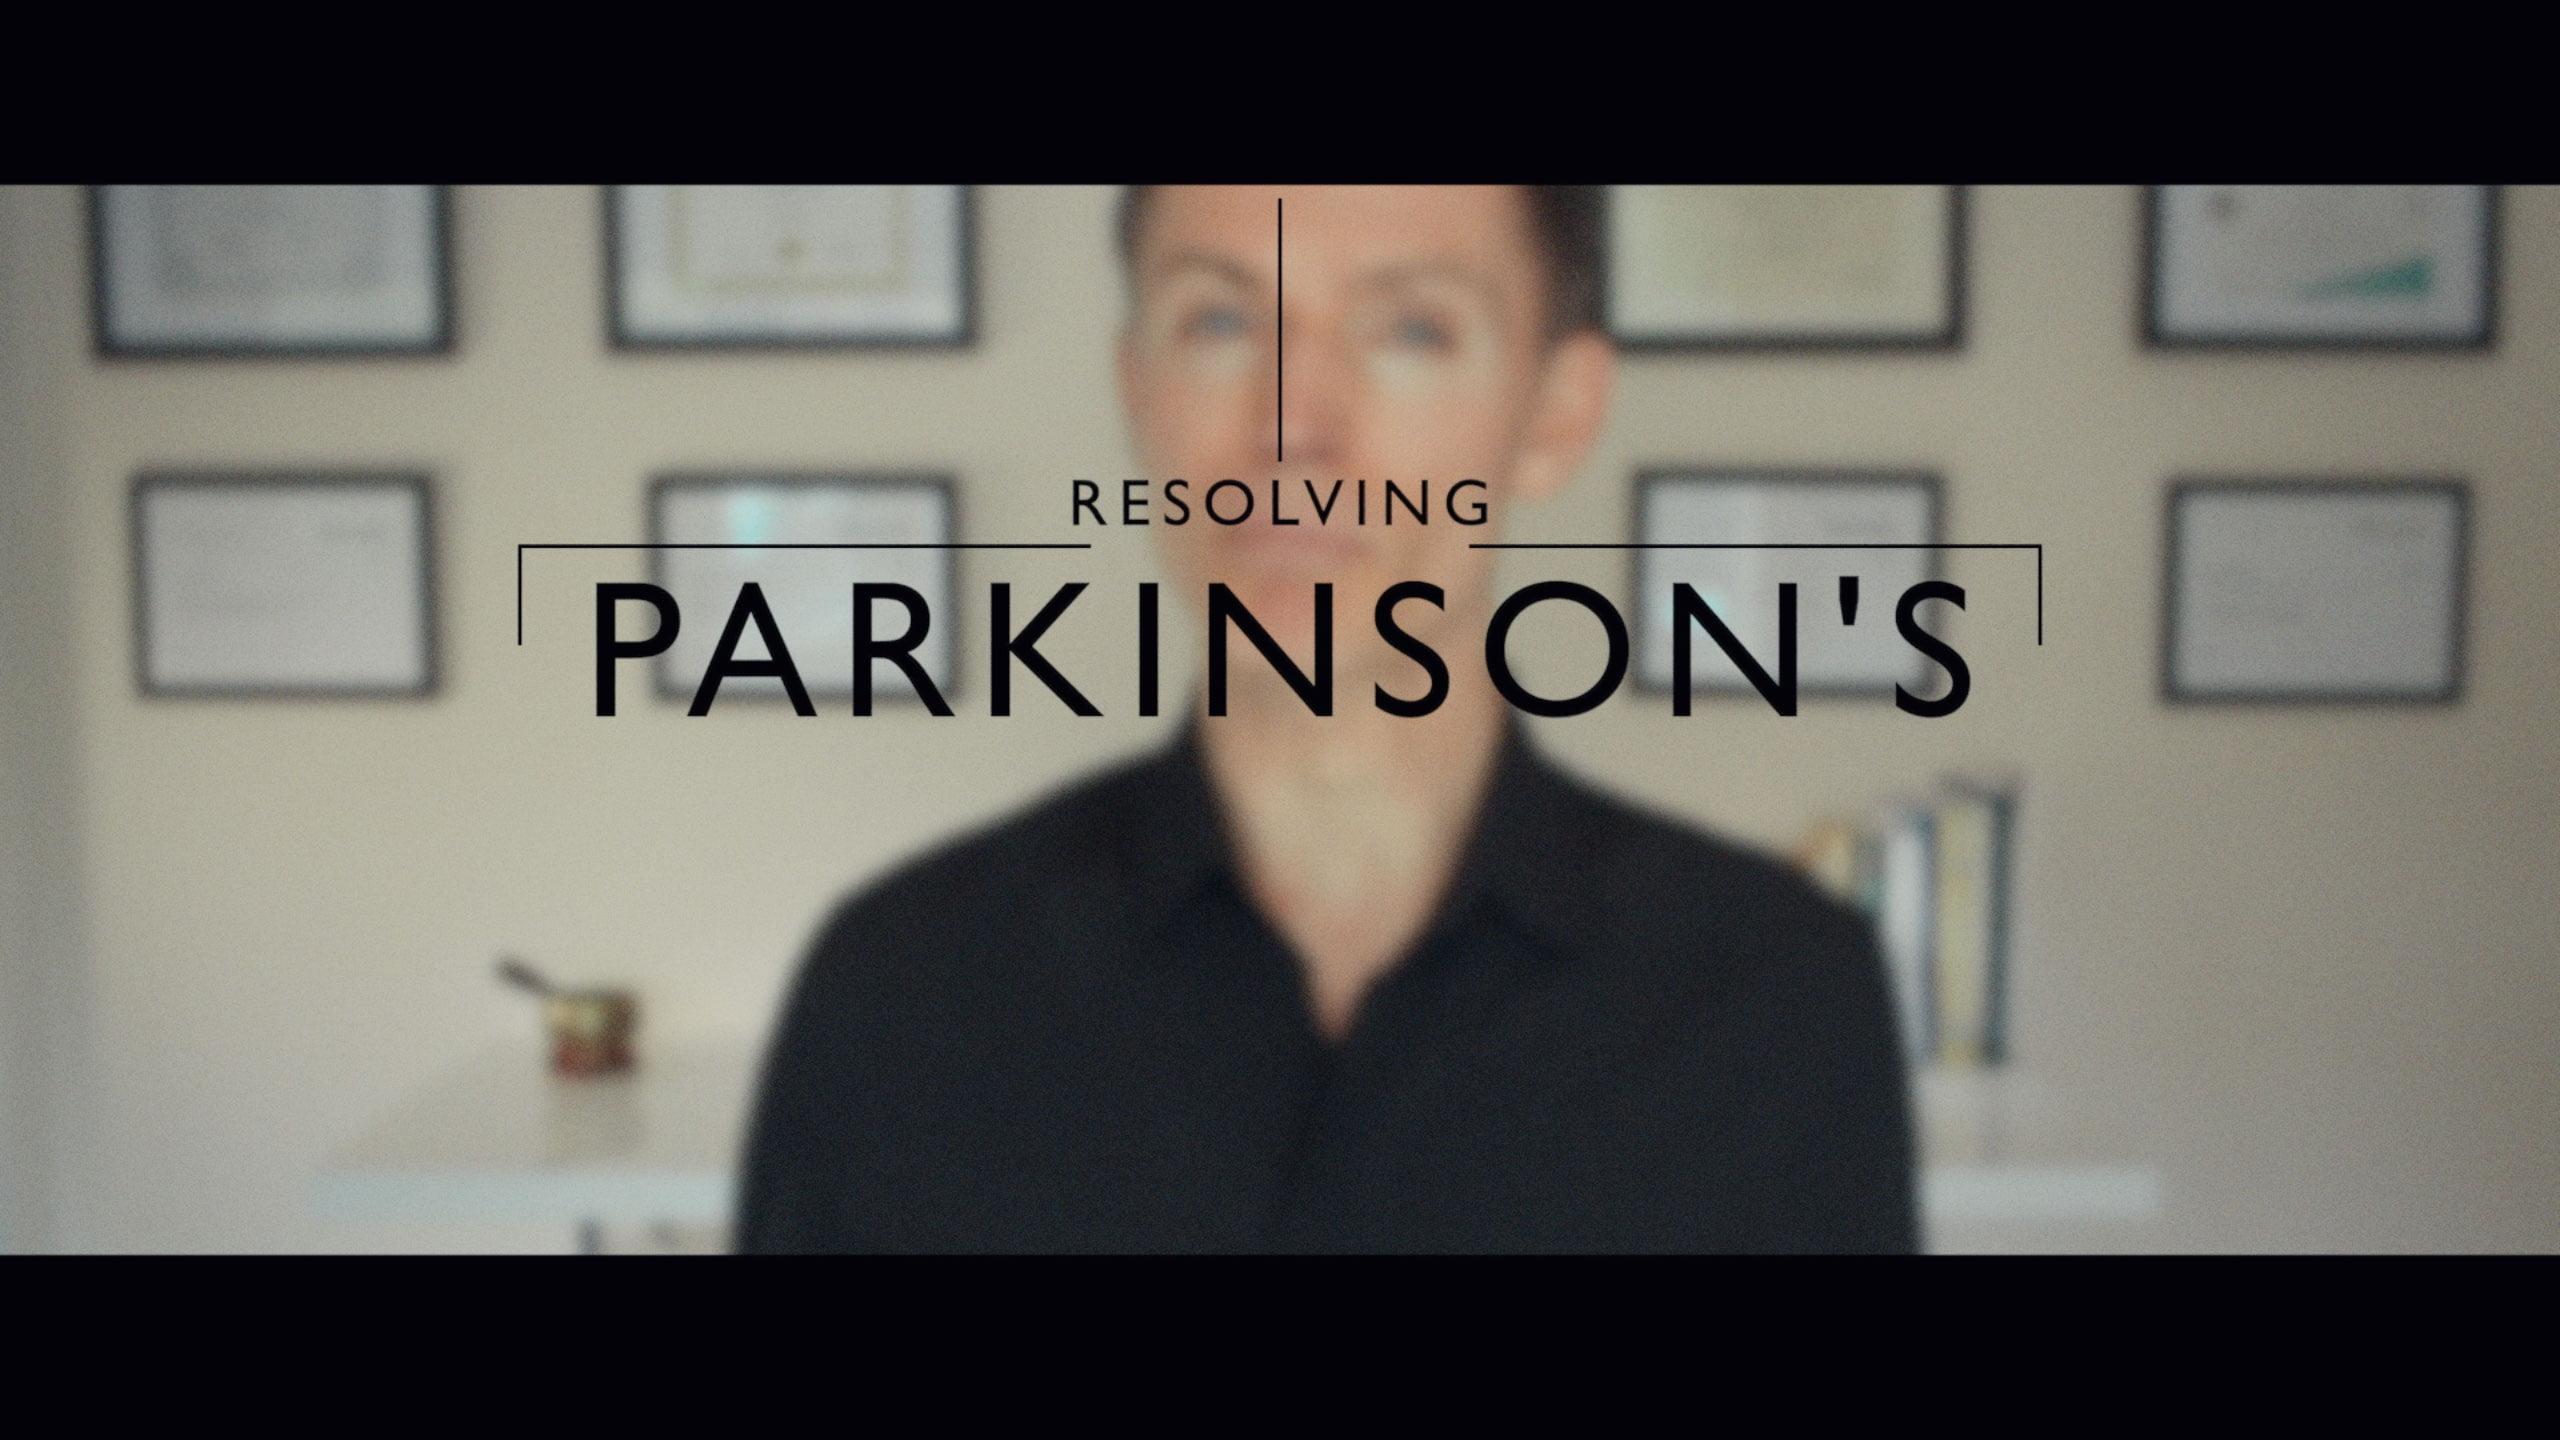 reverse parkinsons disease diet matt janes